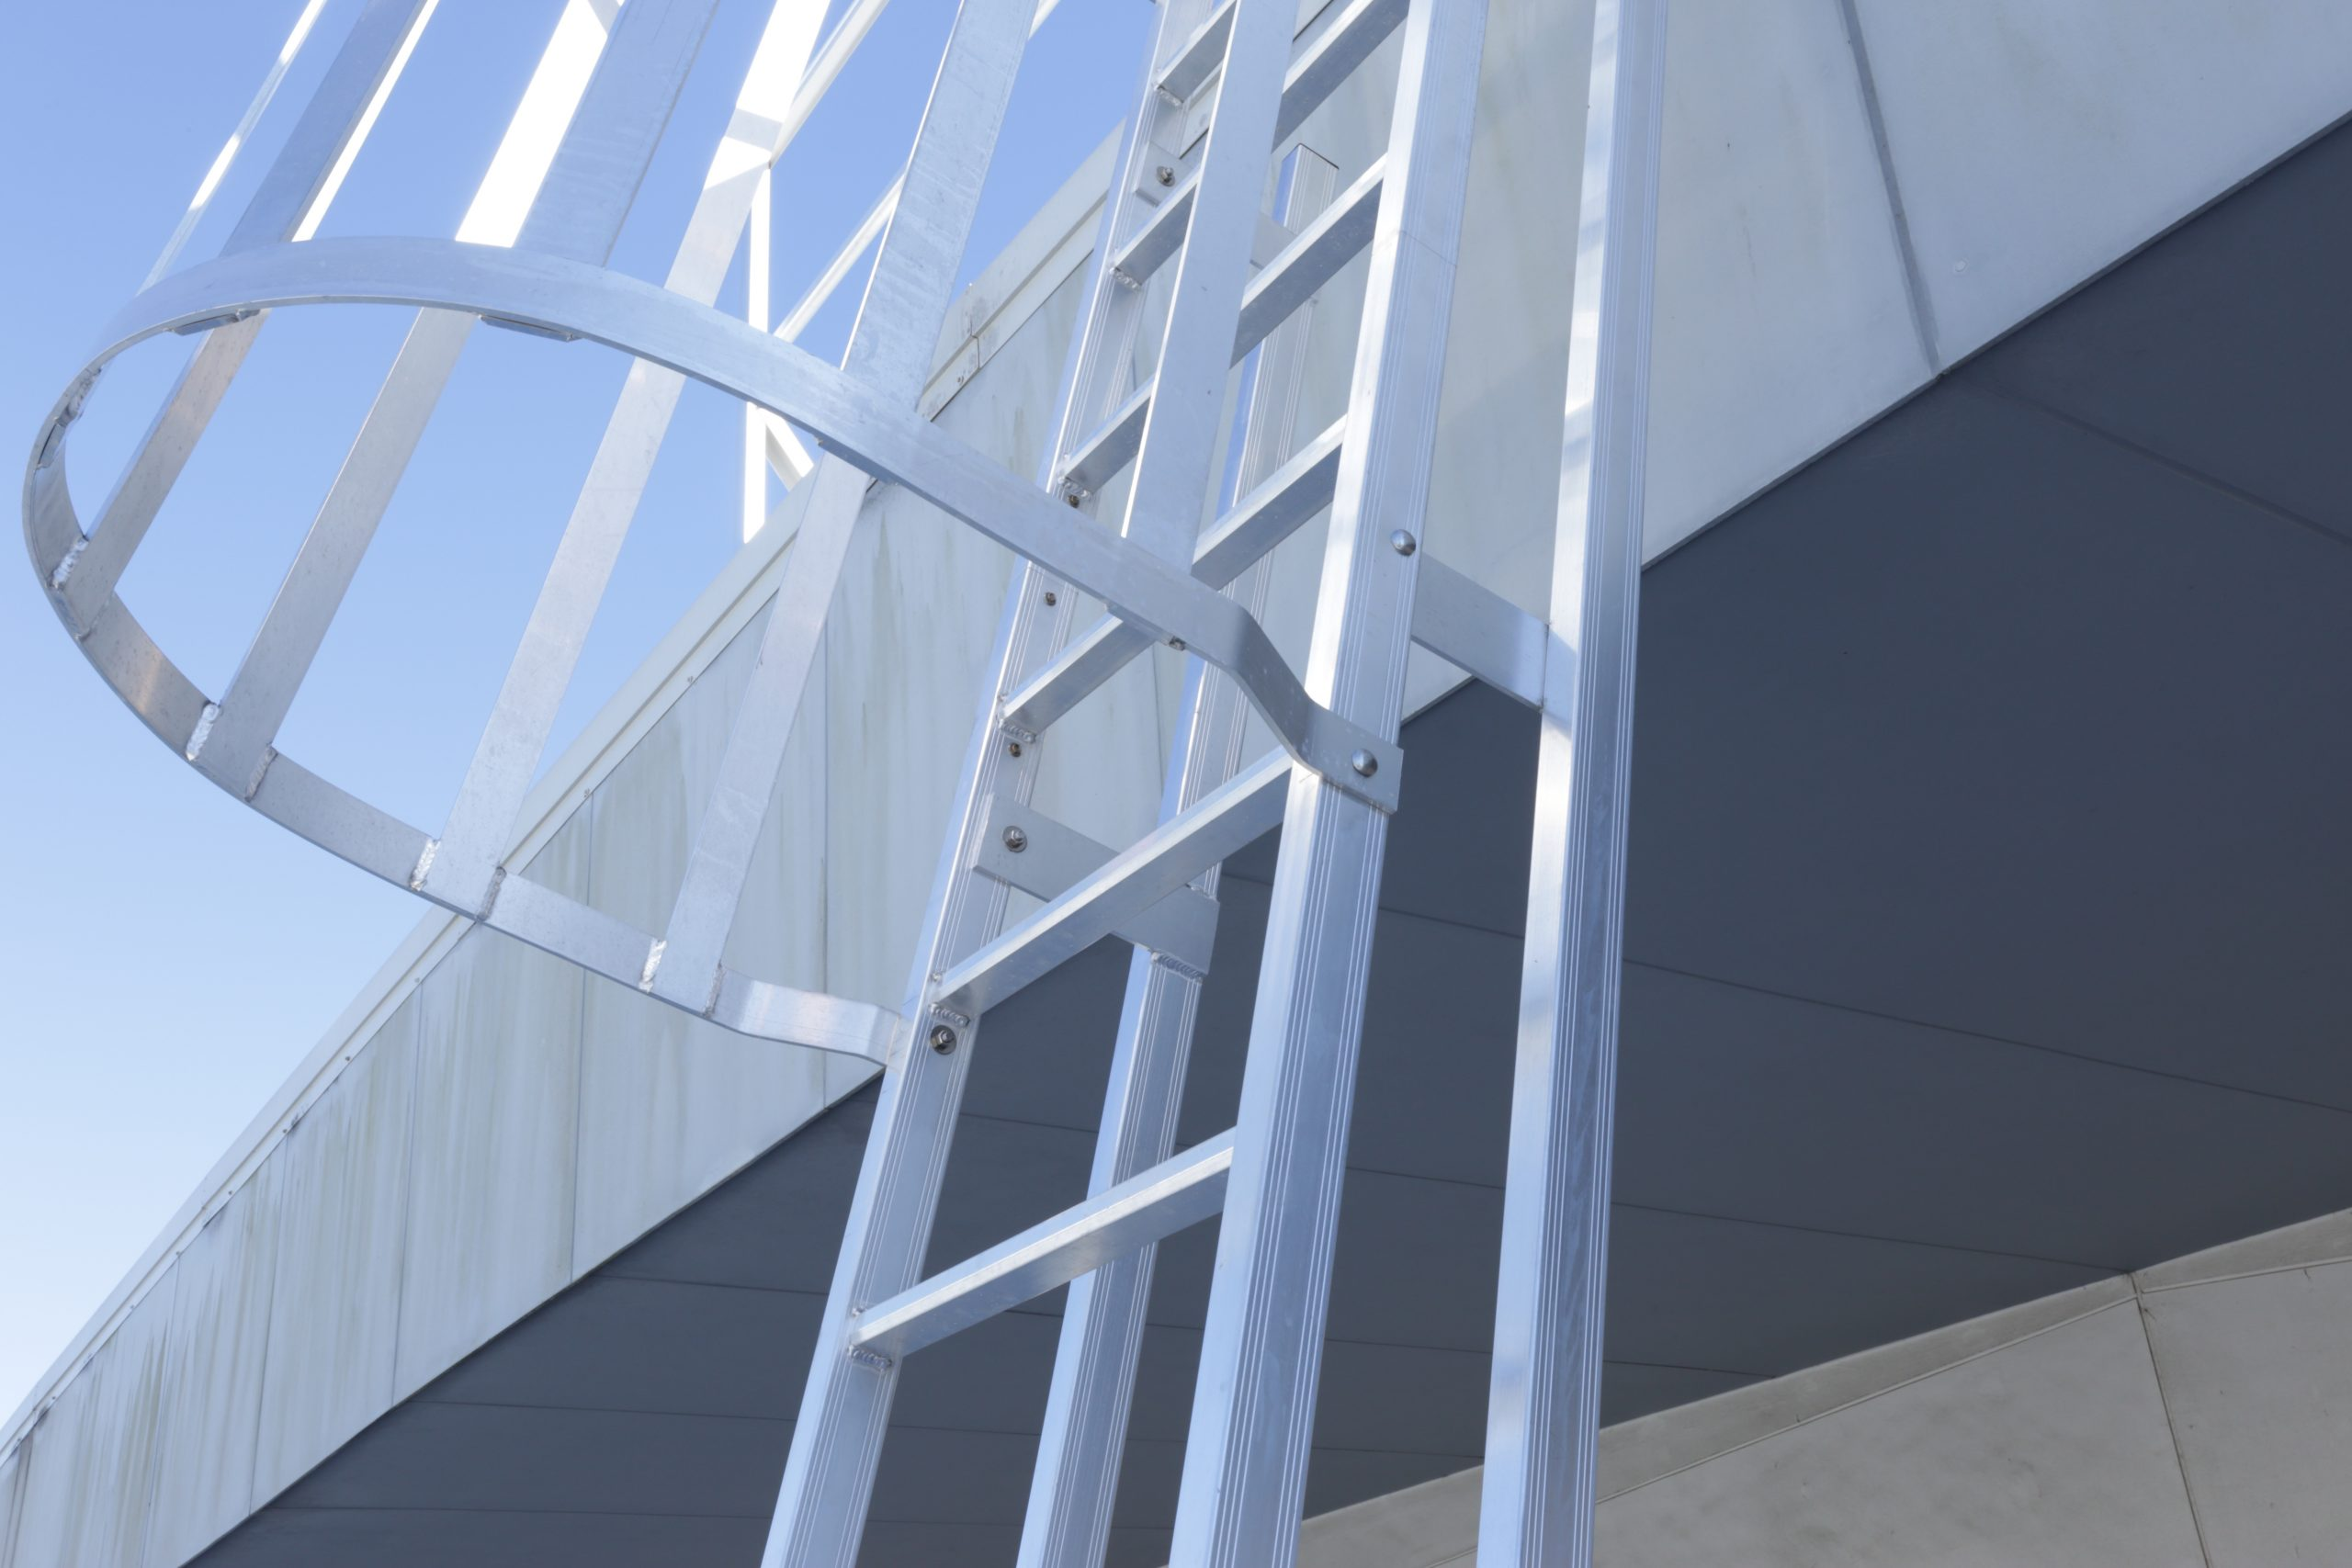 Roof Access Angled Rung Ladder - HawkPro _ JGID